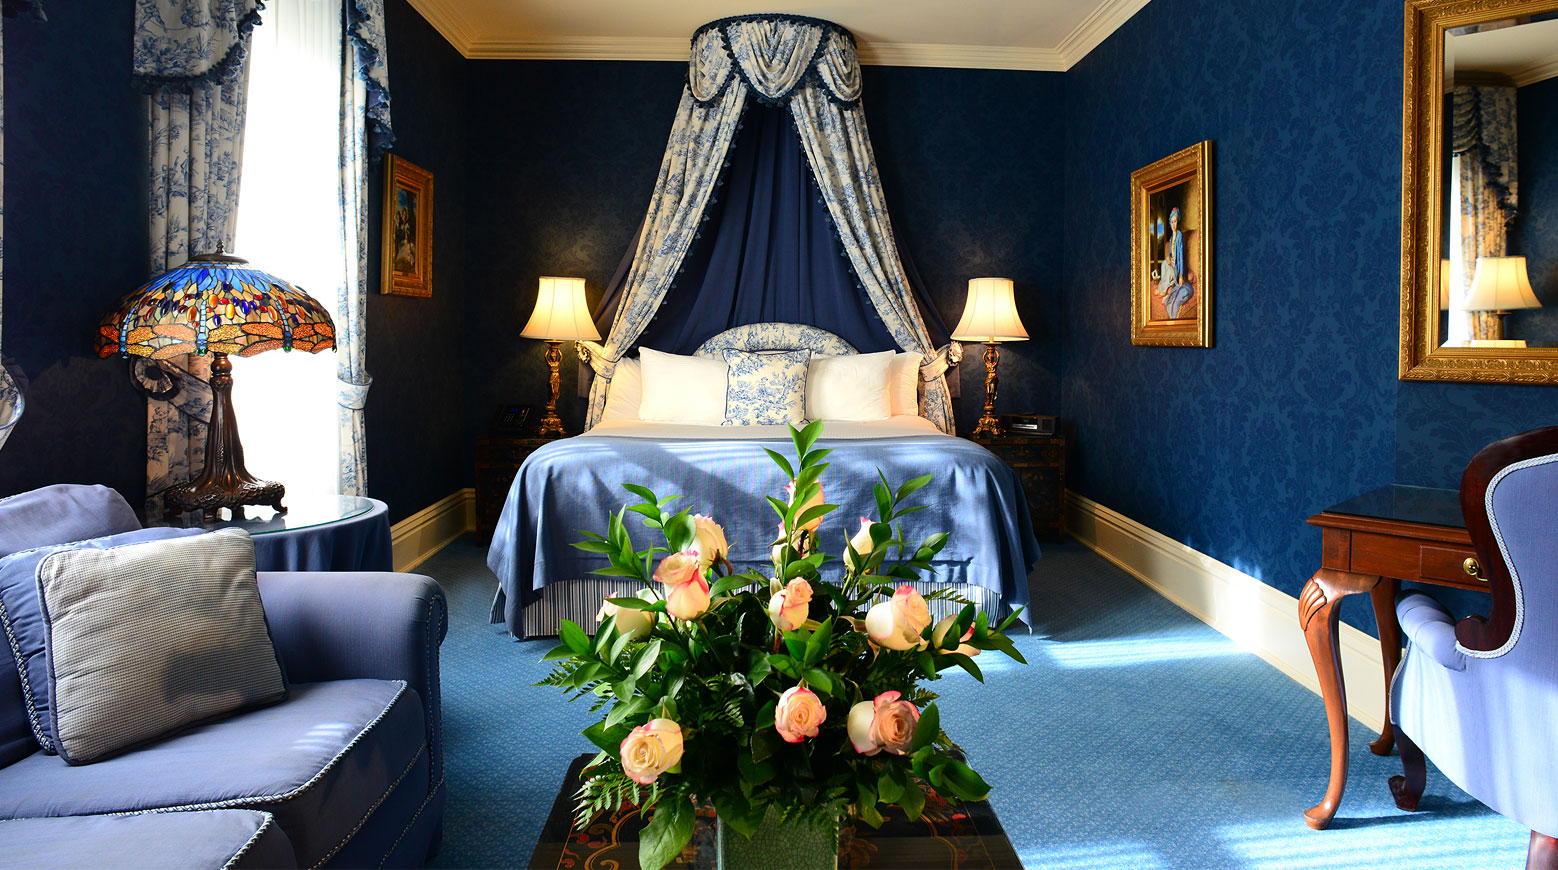 5 Reasons to Visit Punta Can Resorts and Beachfronts Hotels